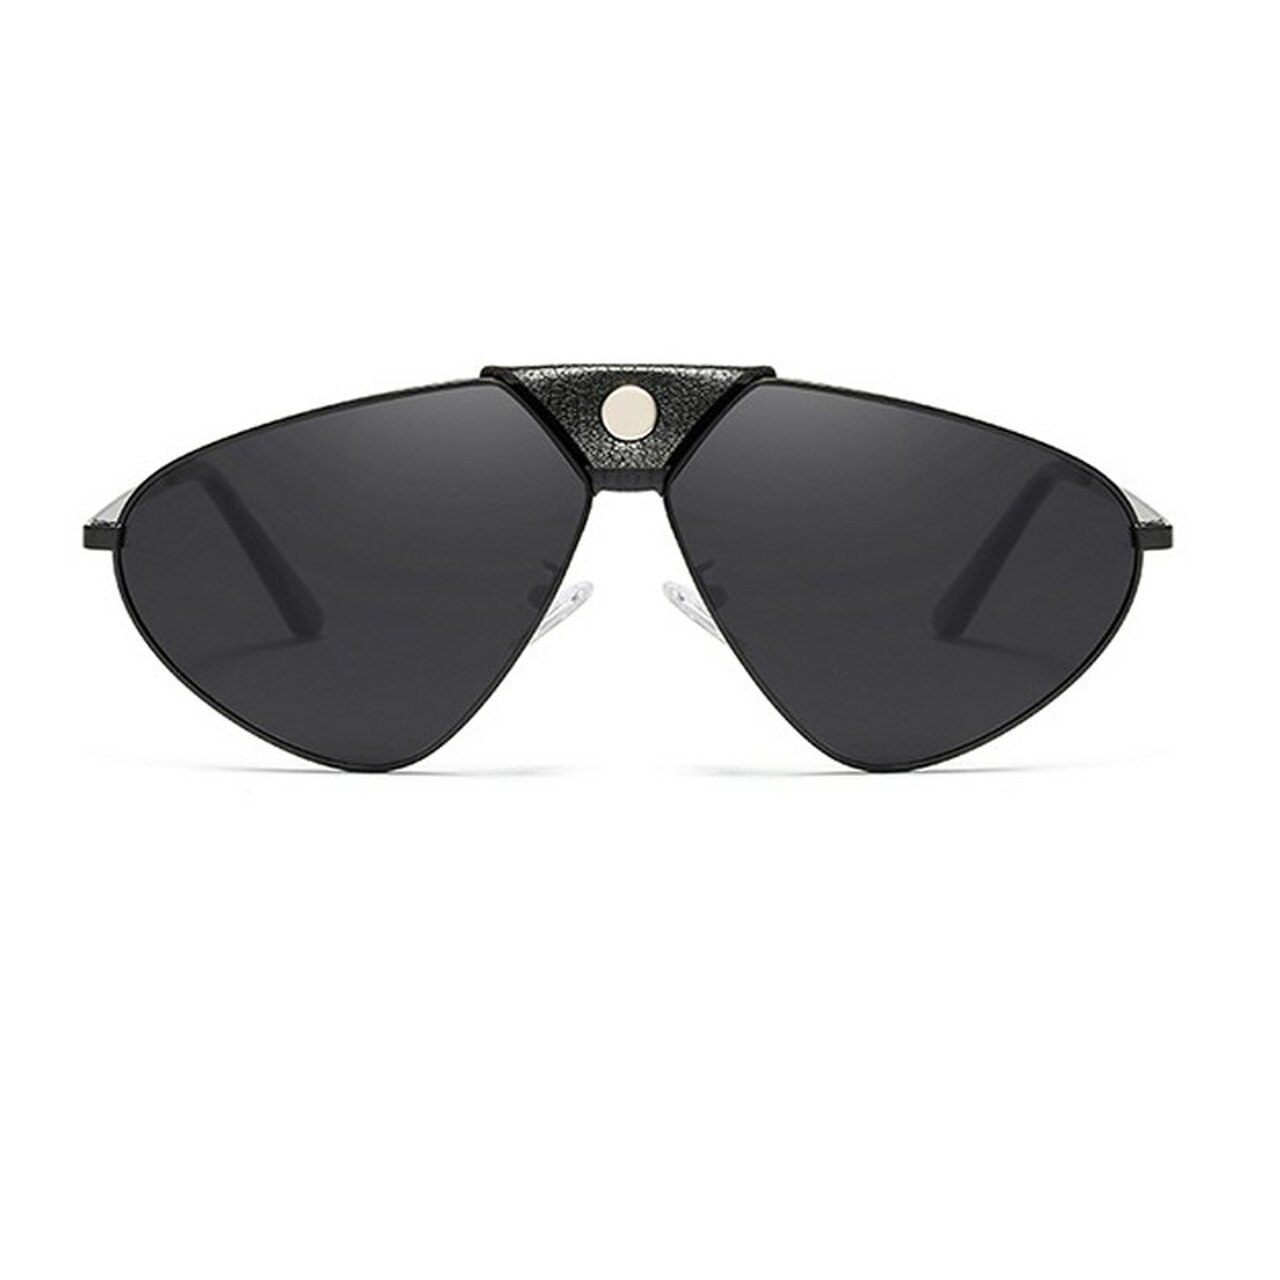 ef23b75b16525 ... ALOZ MICC Retro Men Polarized Sunglasses Women 2019 Brand Design  Fashion Sun Glasses for Men Vintage ...